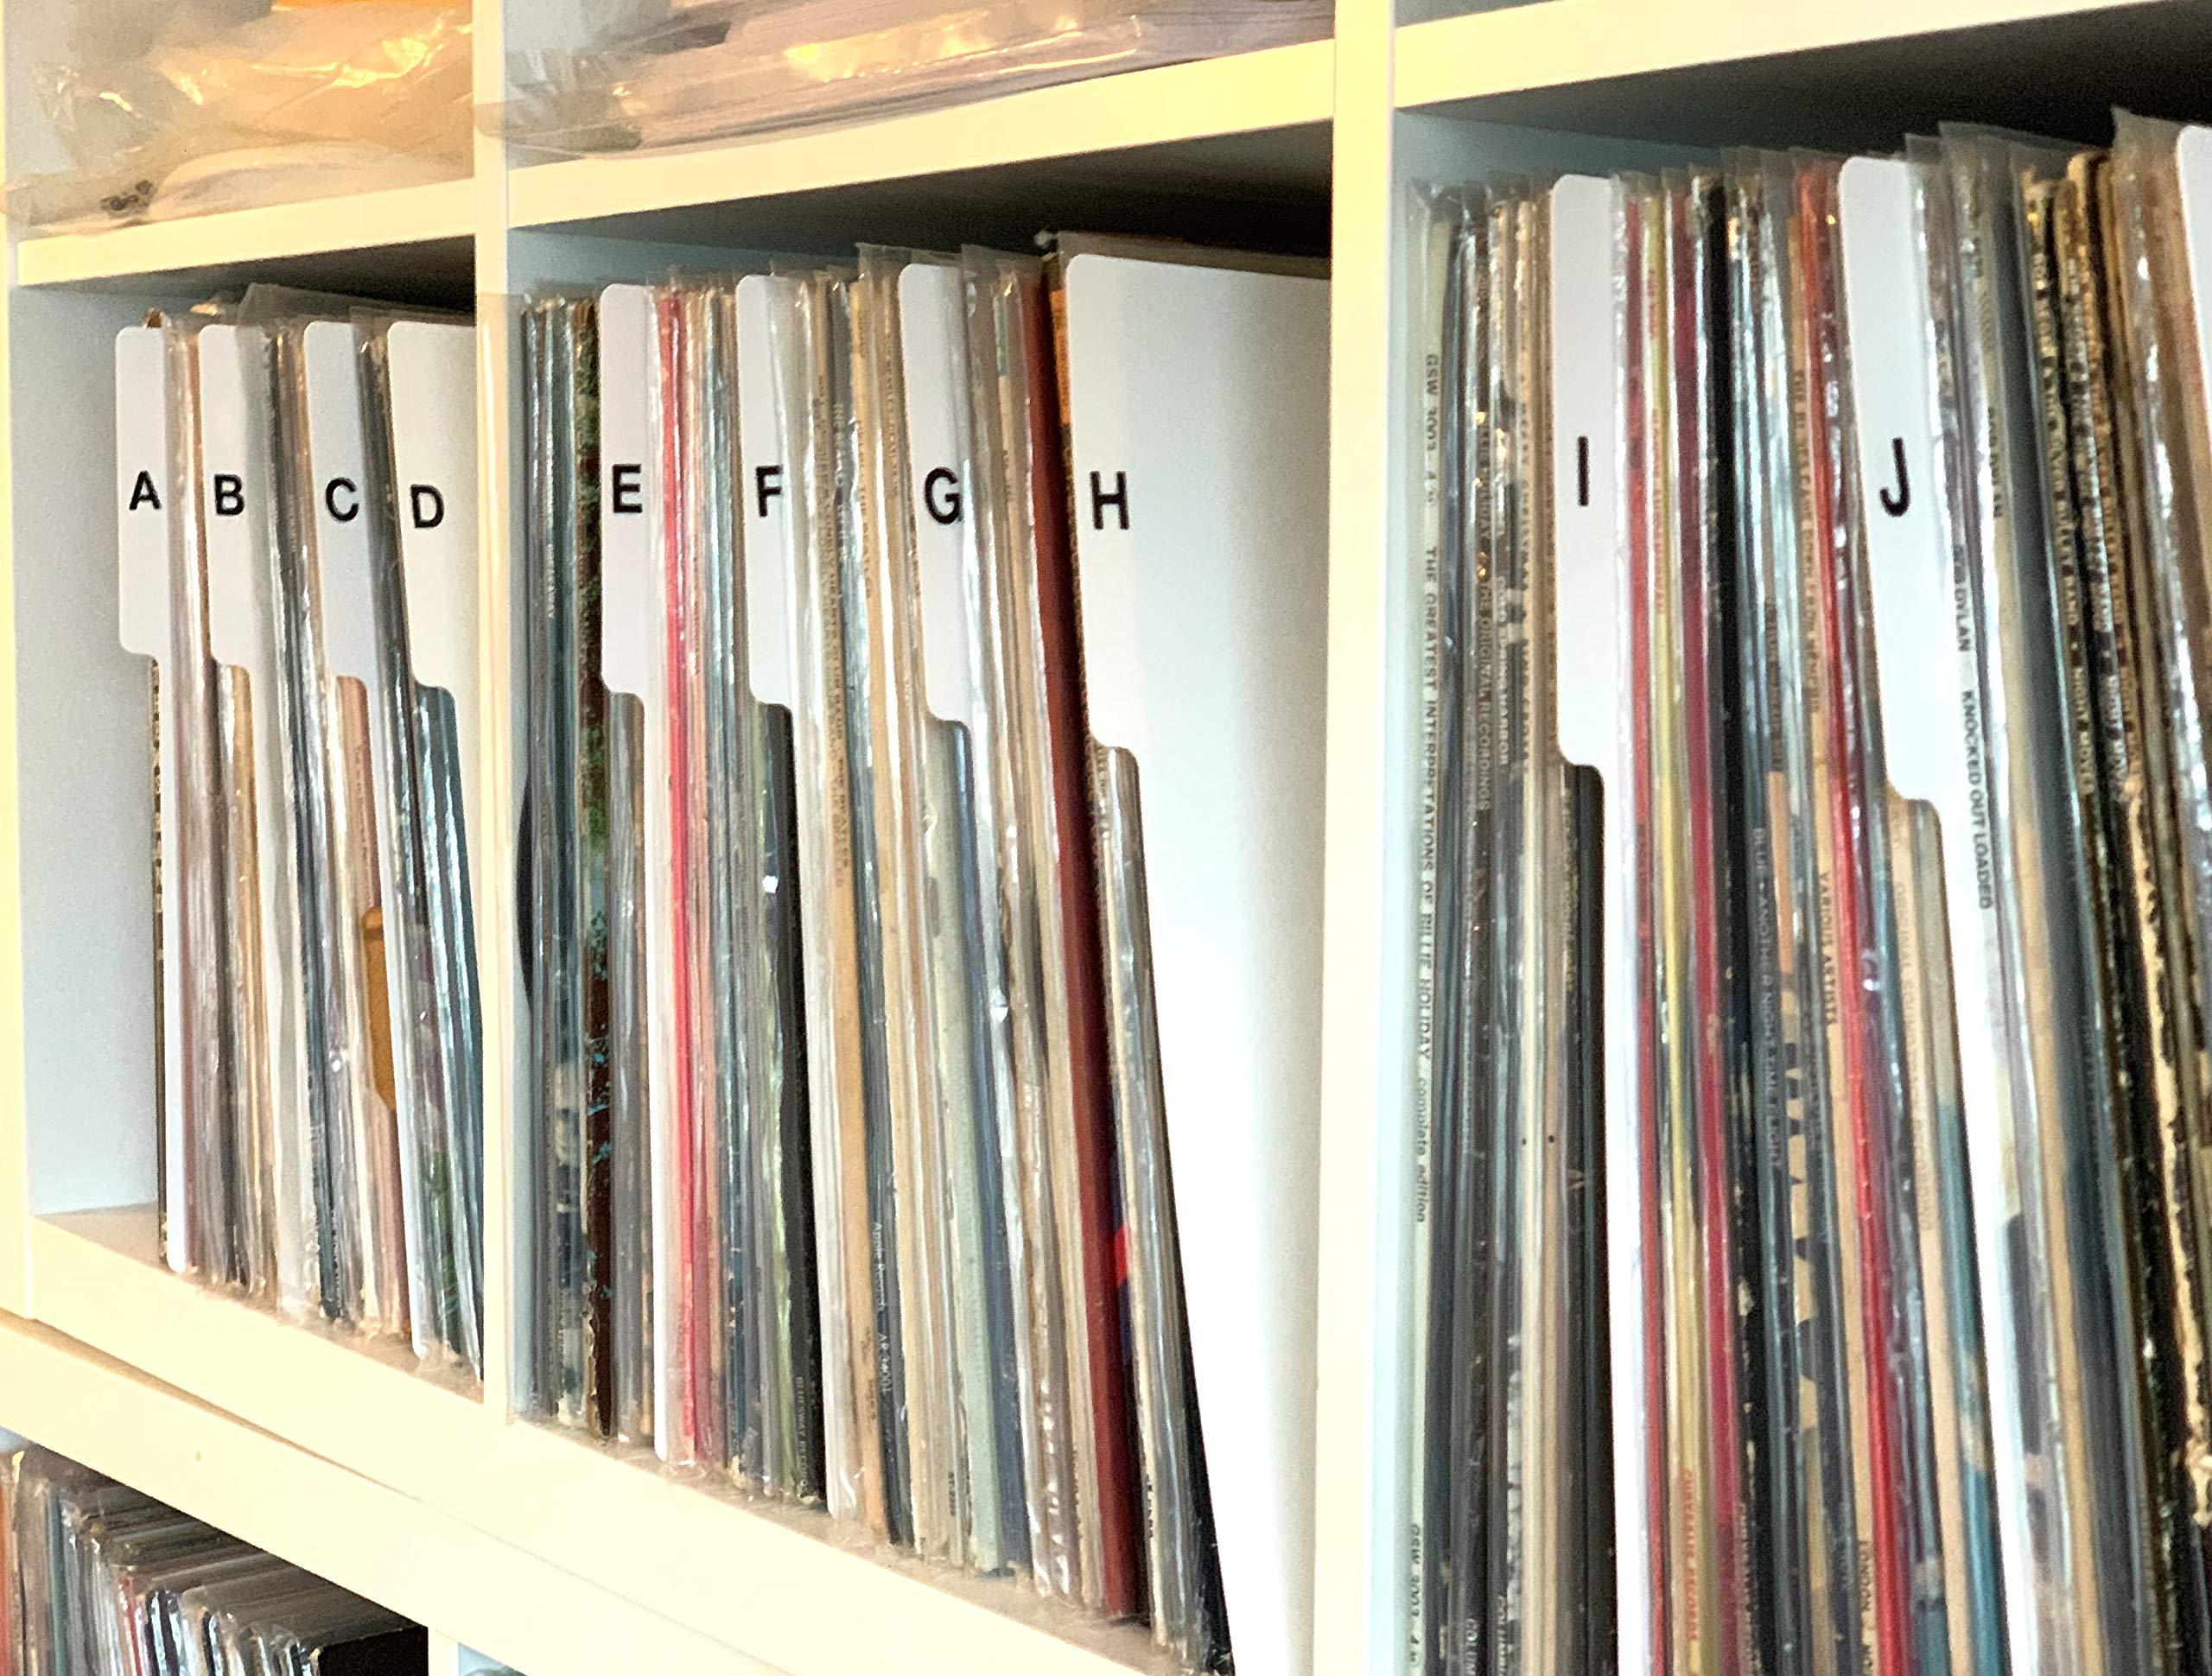 A to Z Record Dividers Vertical Tab Professional White Index 12'' 33 LPs Vinyl Album Organizers/Organization A-Z Alphabet Alphabetize Alphabetical Cards